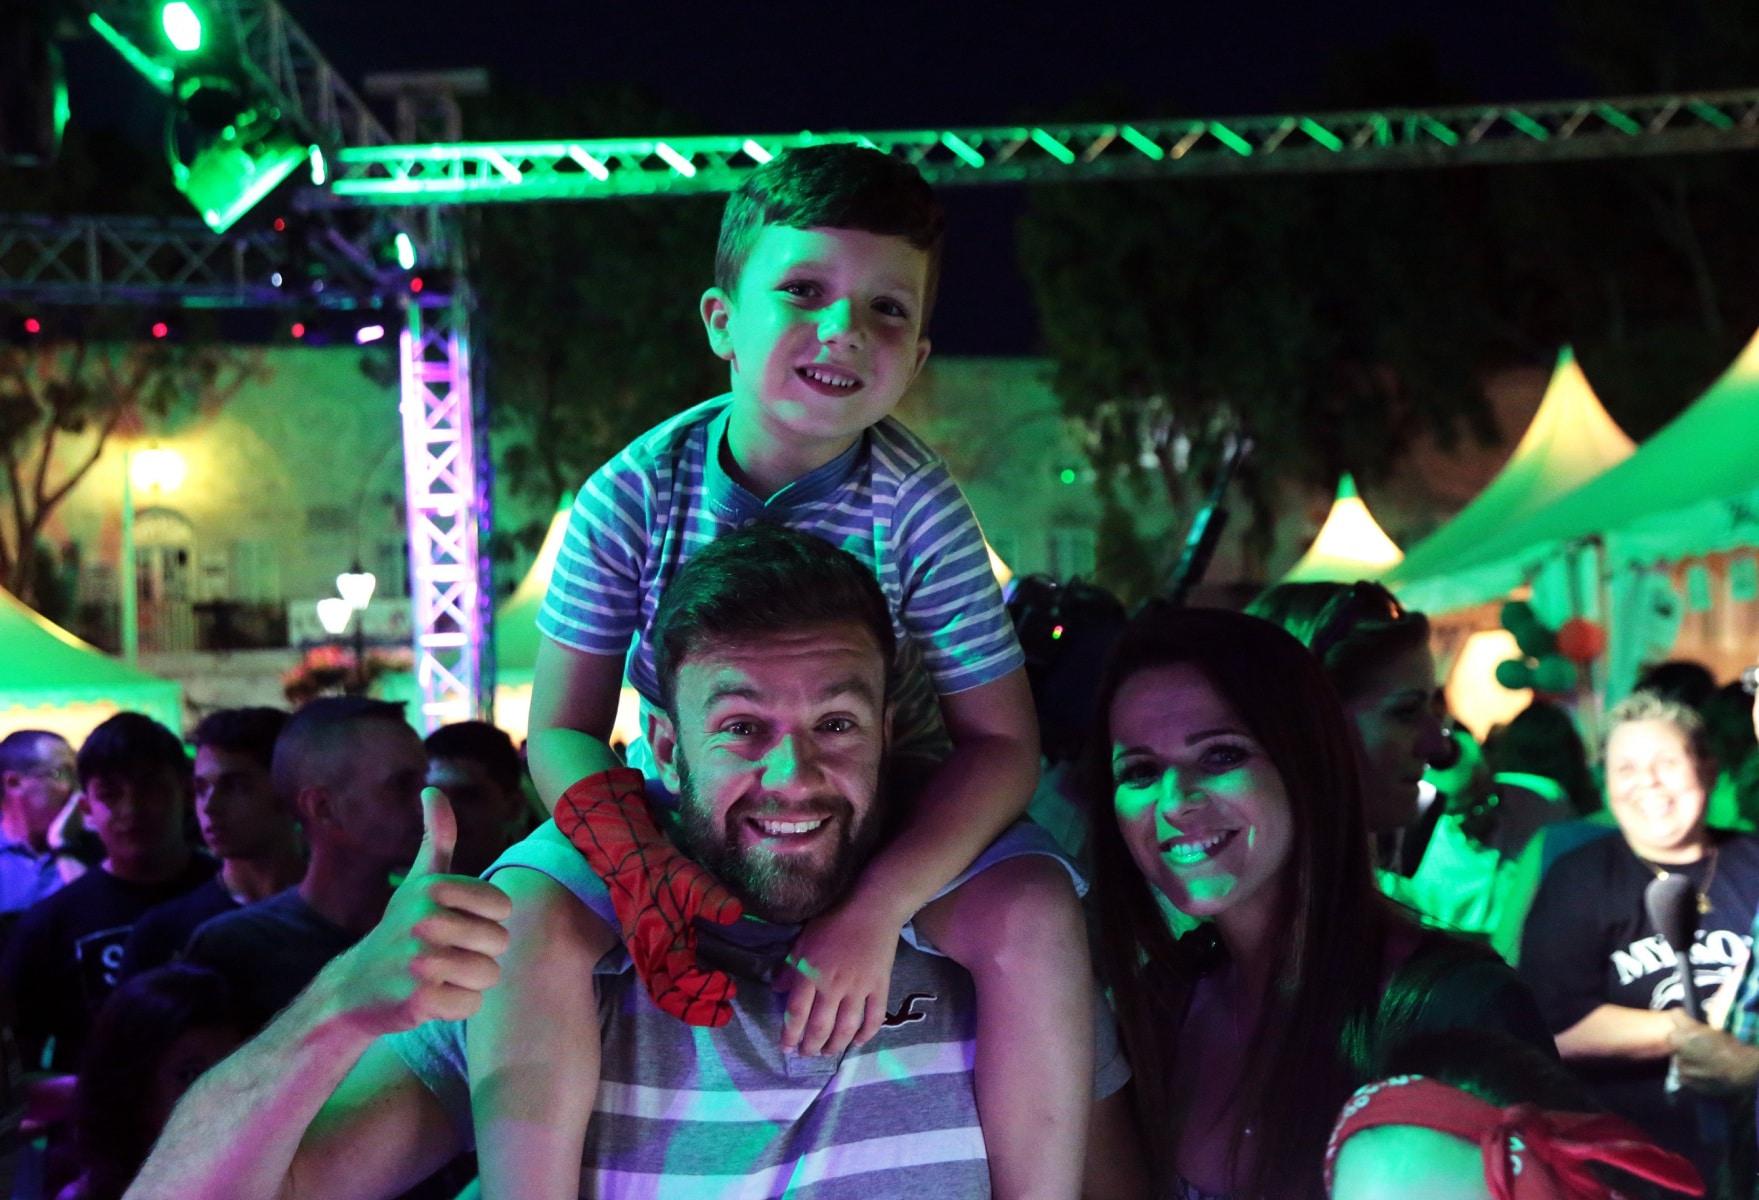 18-jun-2016-noche-de-la-calentita-en-gibraltar_27758111691_o